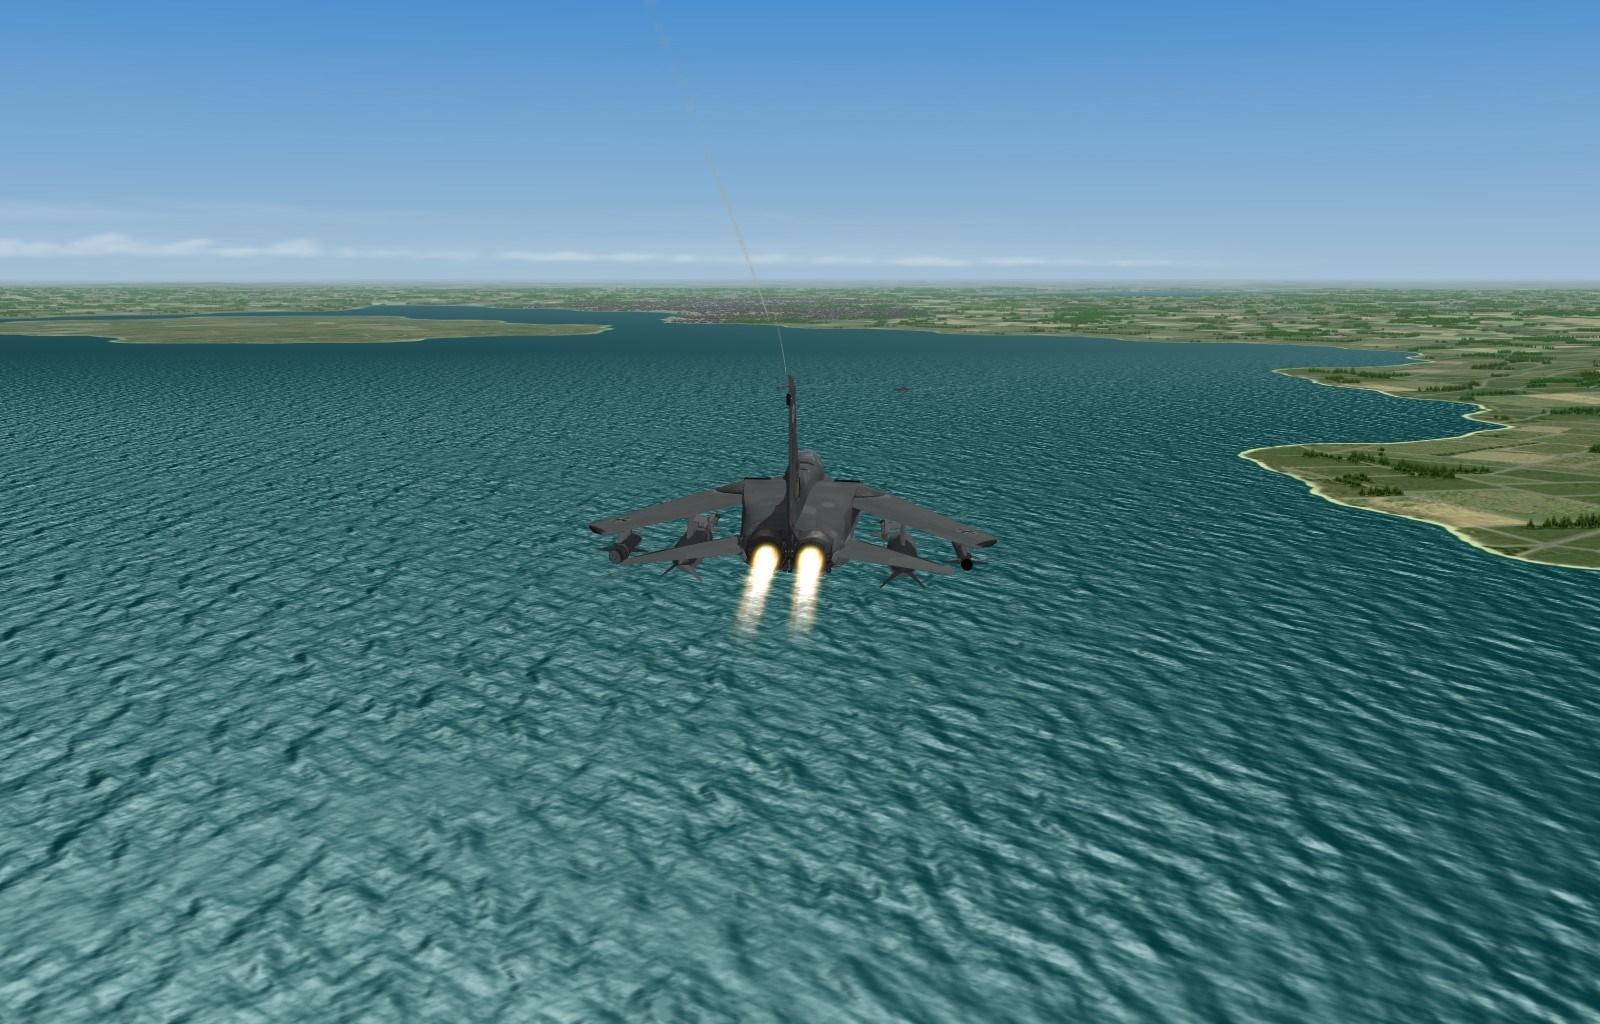 TornadoMFG00021.JPG